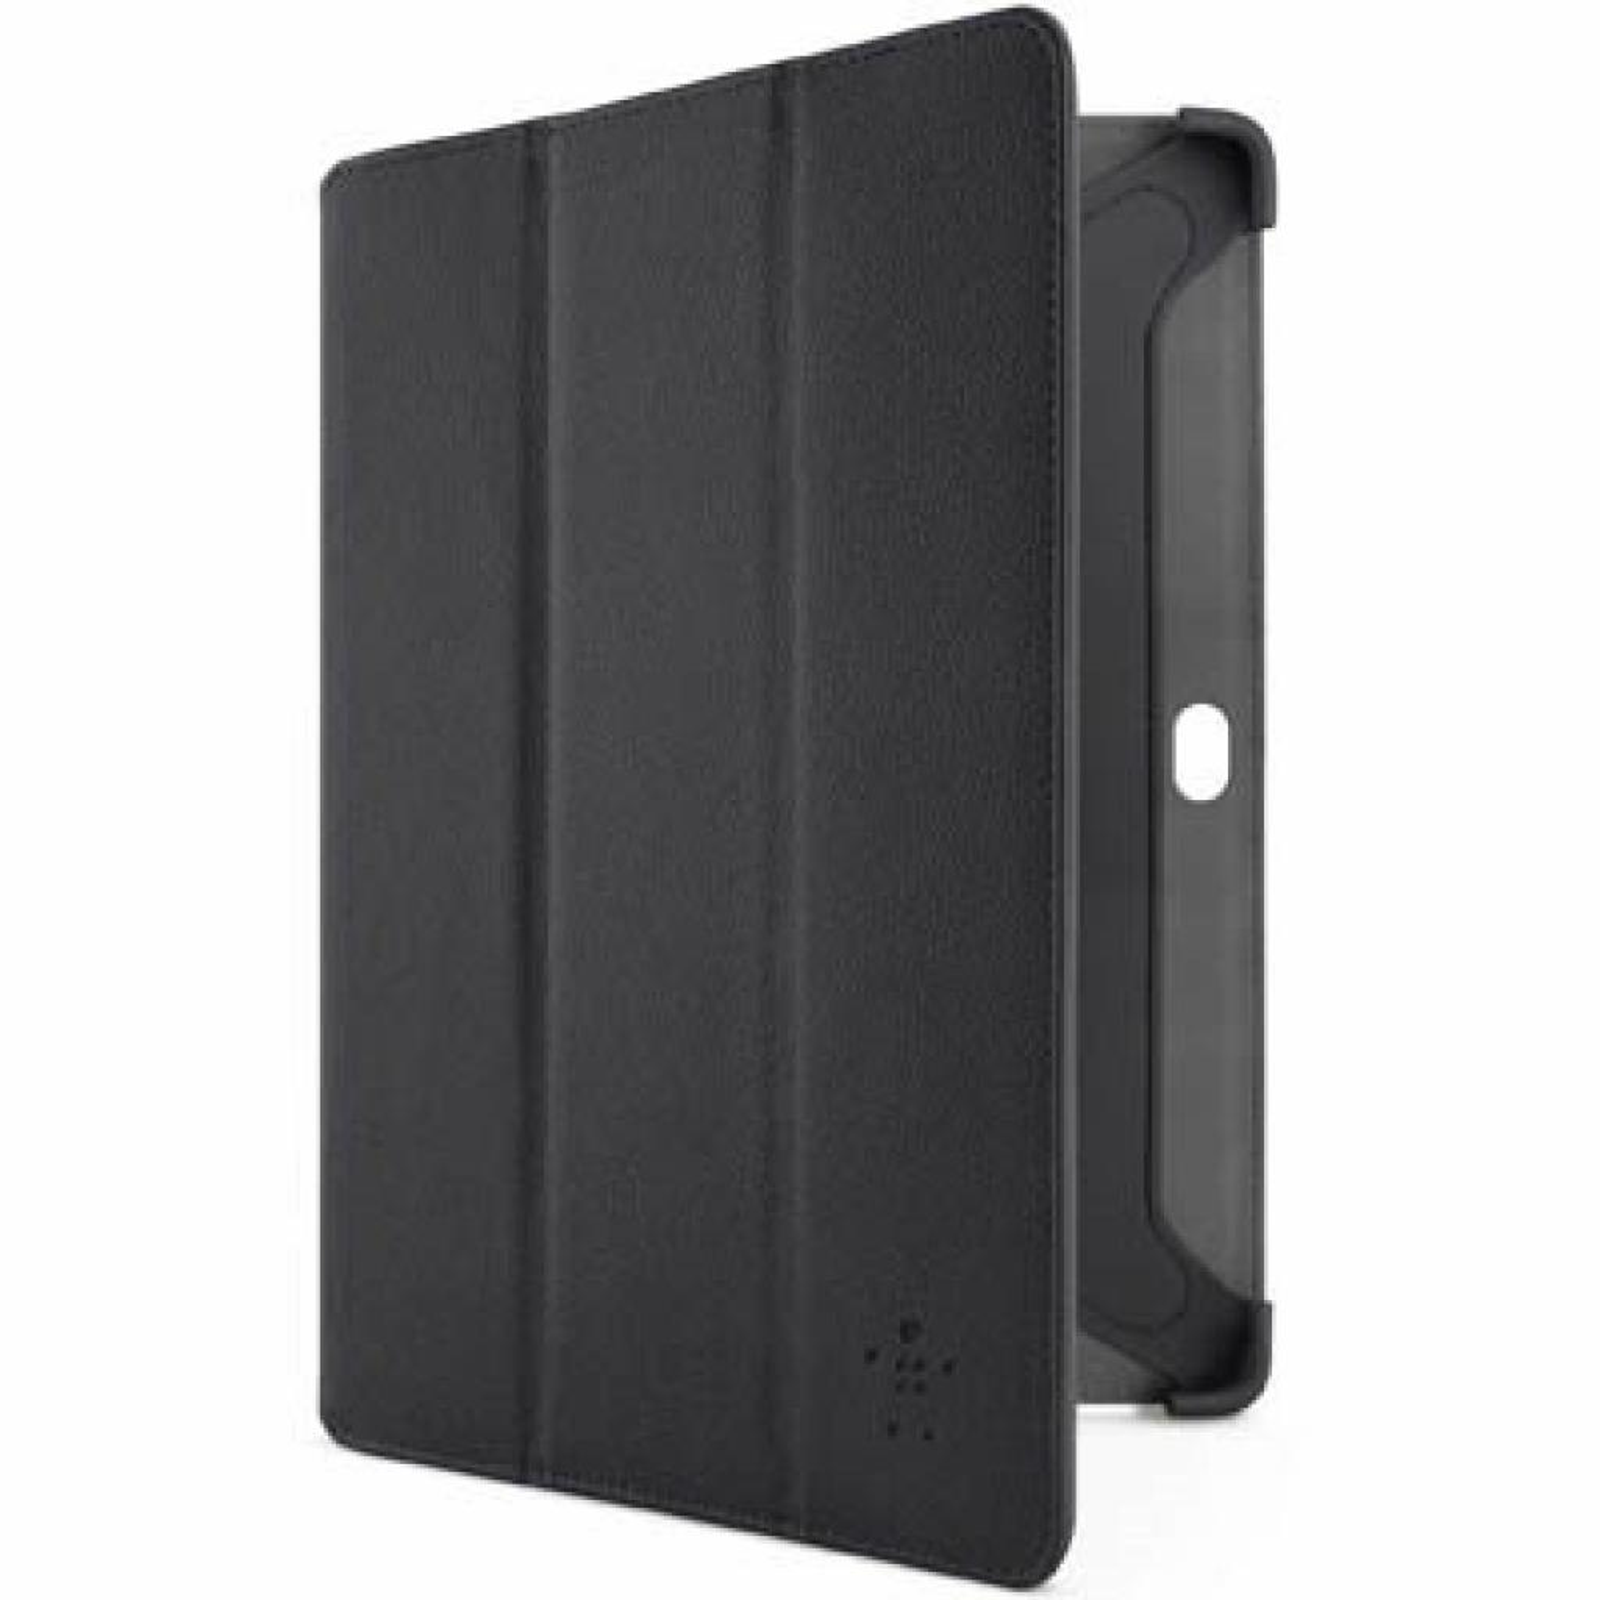 Чехол для планшета Belkin 8 Galaxy Note Folio Cinema Stripe (F7P088vfC00)